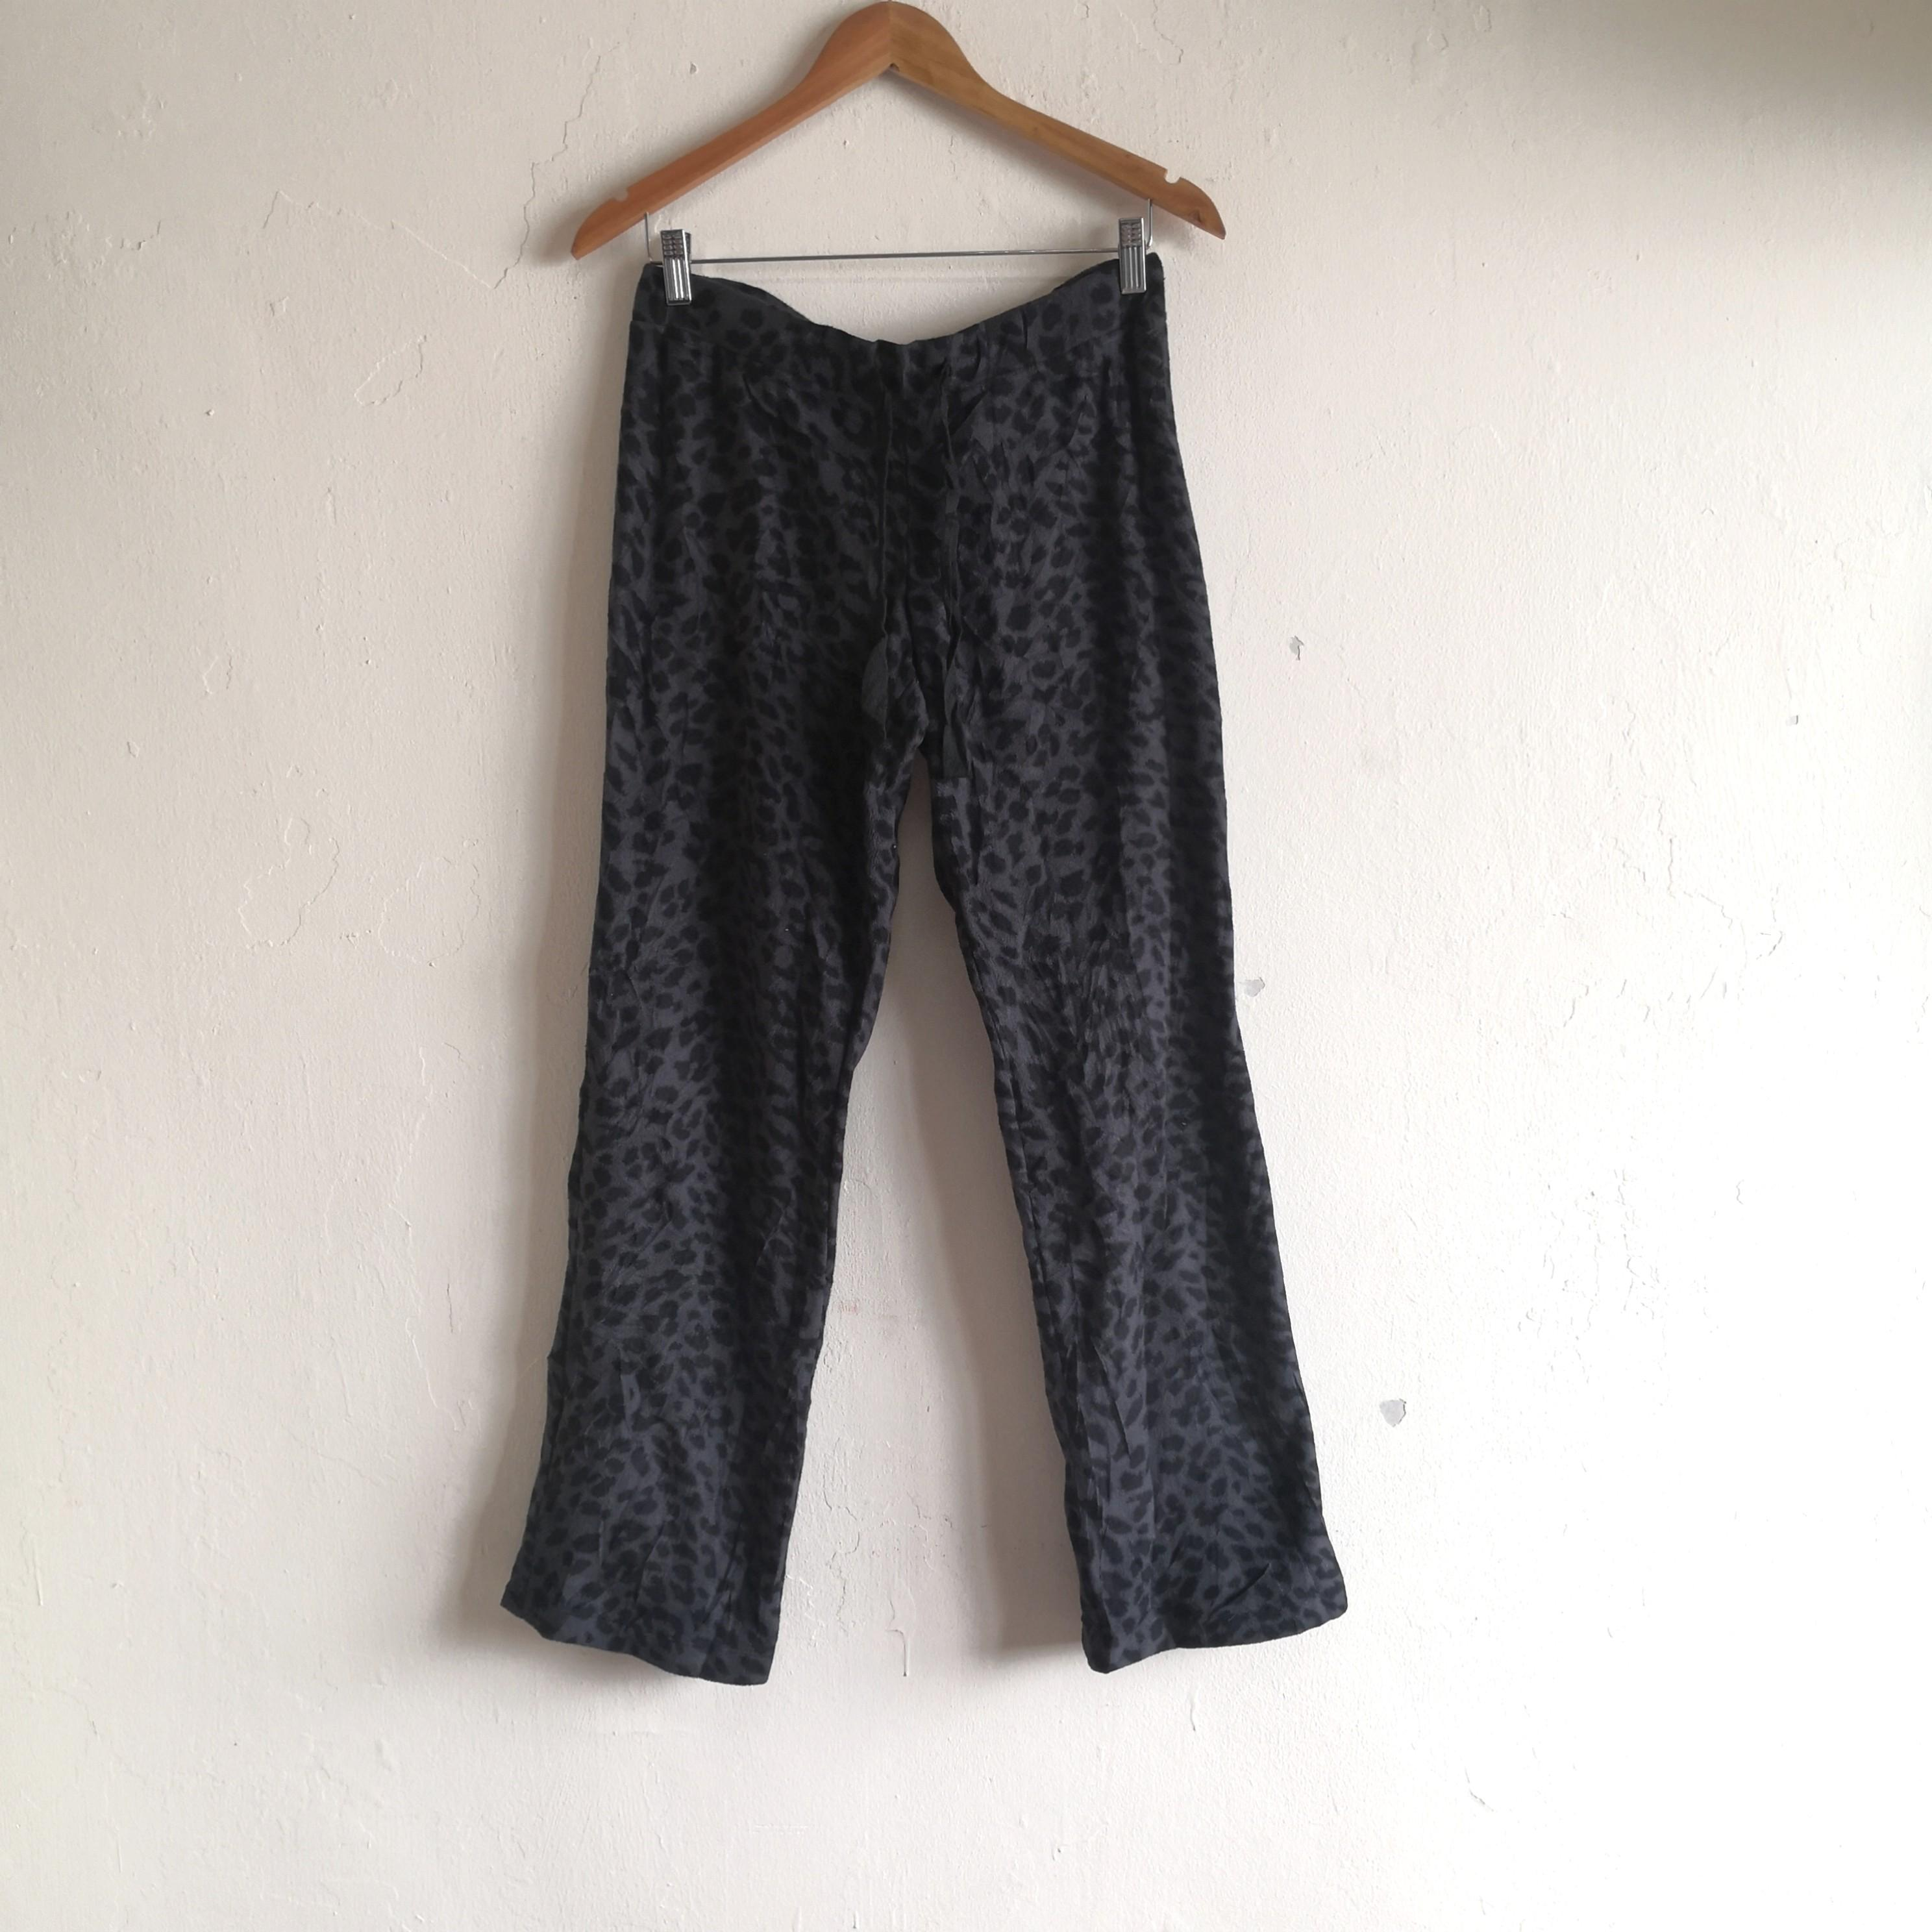 Leopard Printed Polyester Pajama Pants